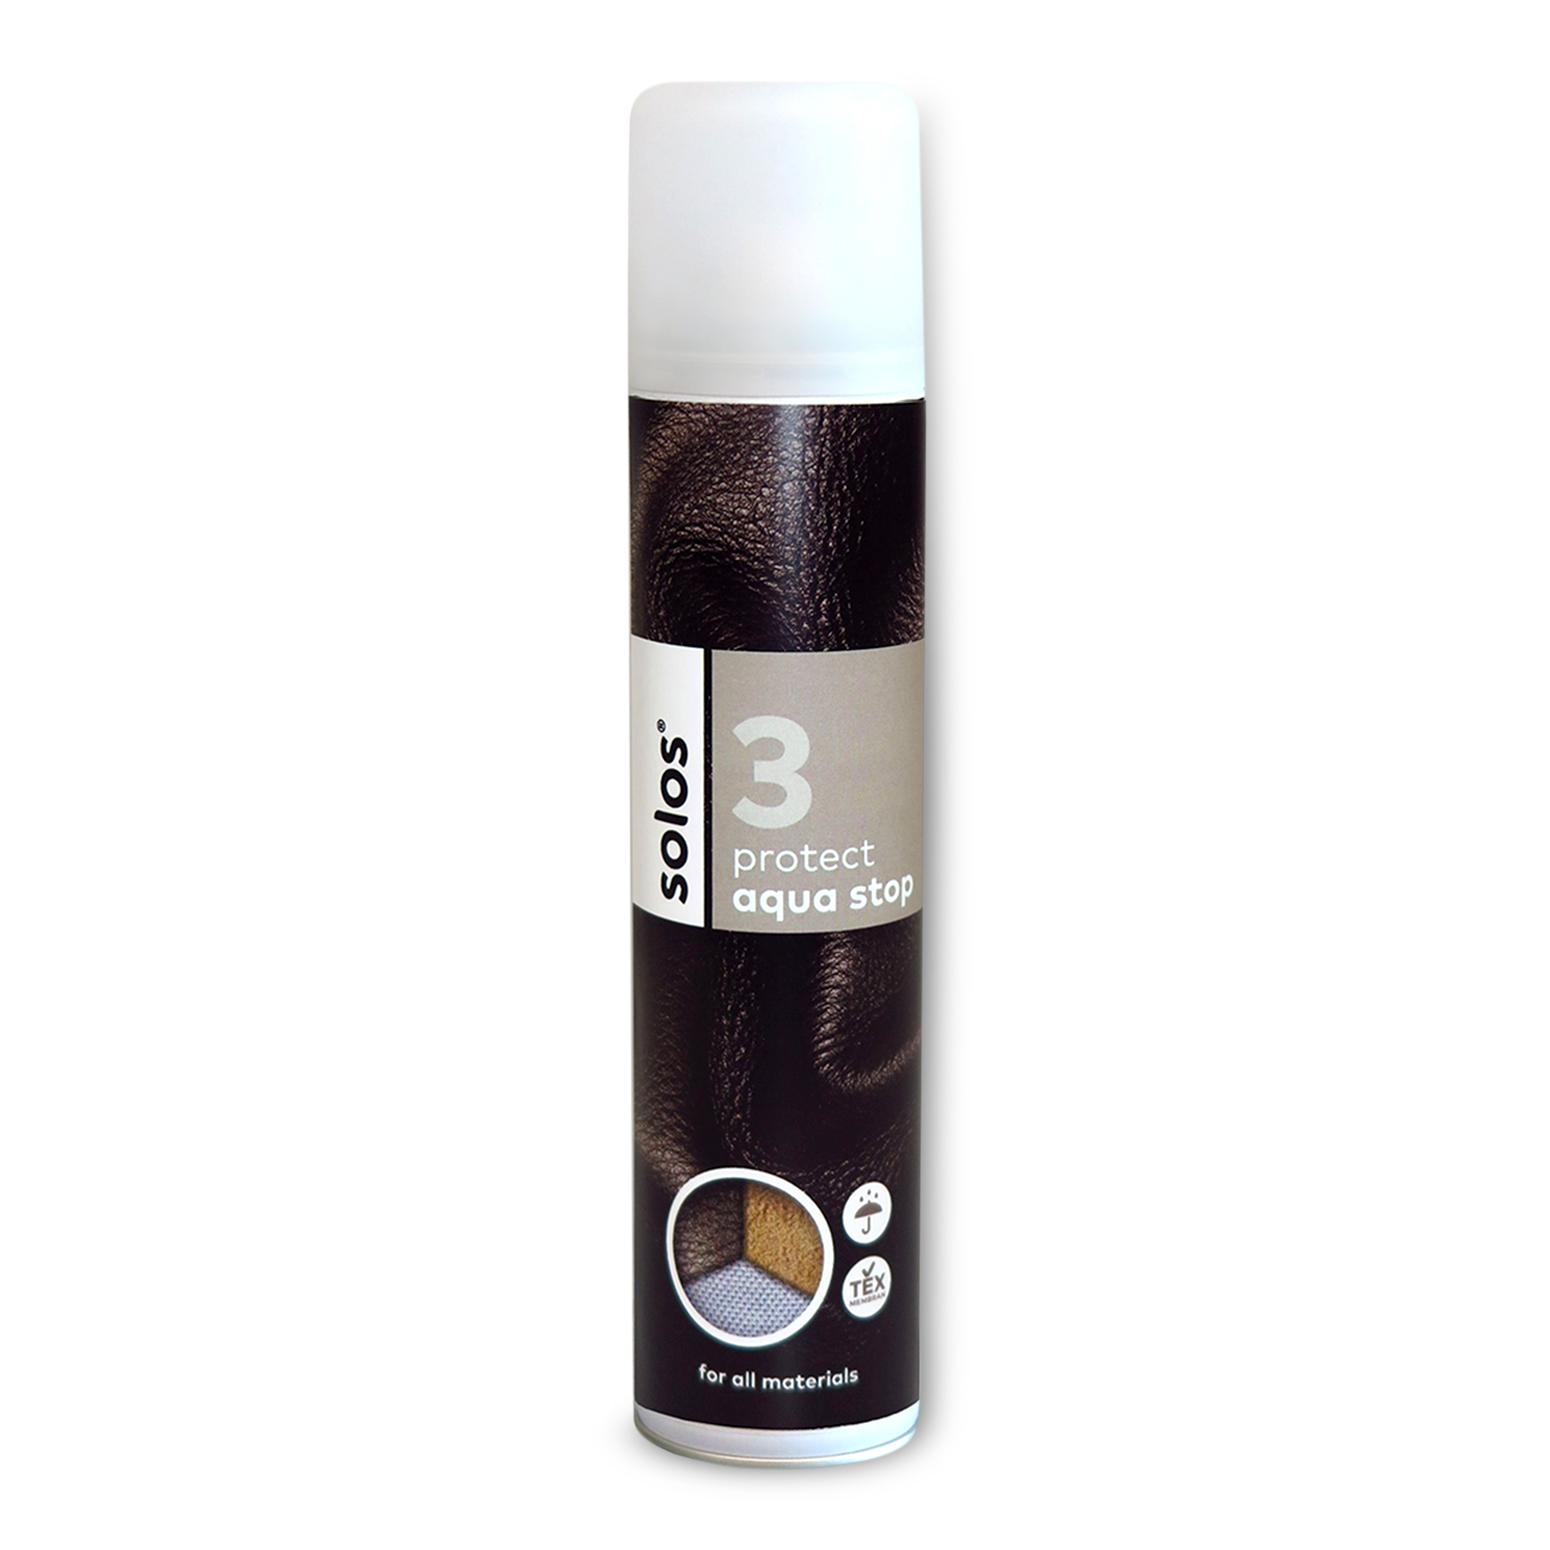 aqua stop 3733 999 one size schuhpflege von marco tozzi online kaufen. Black Bedroom Furniture Sets. Home Design Ideas